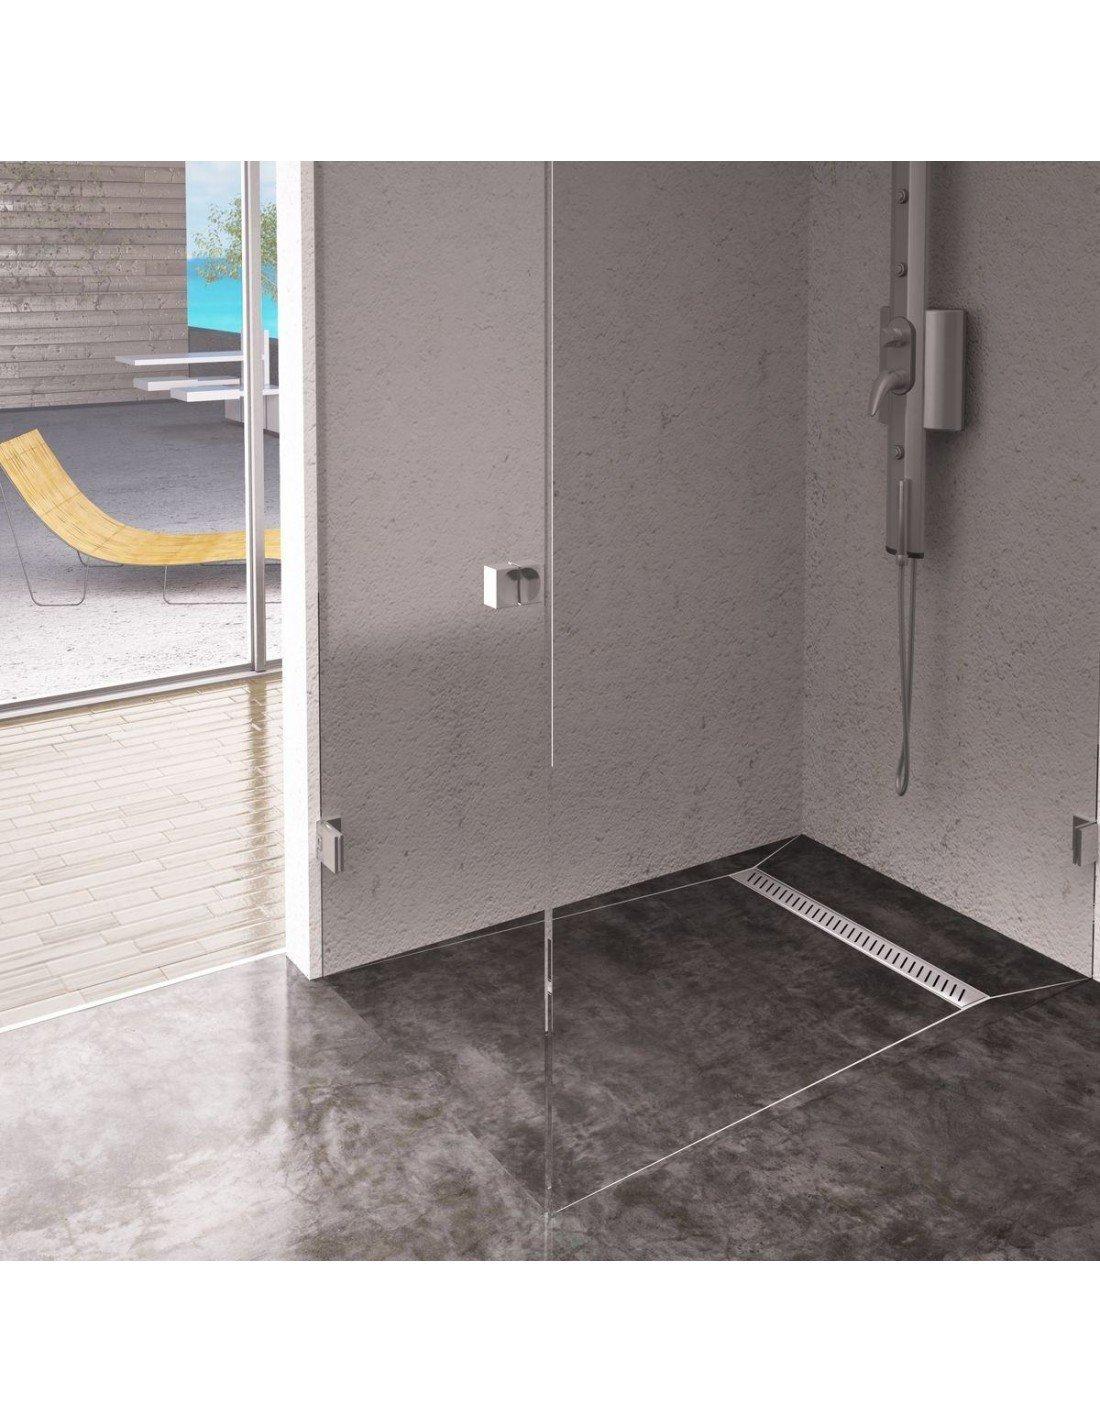 Wet Room Gully Stainless Steel Linear Shower Drain 600 Mm